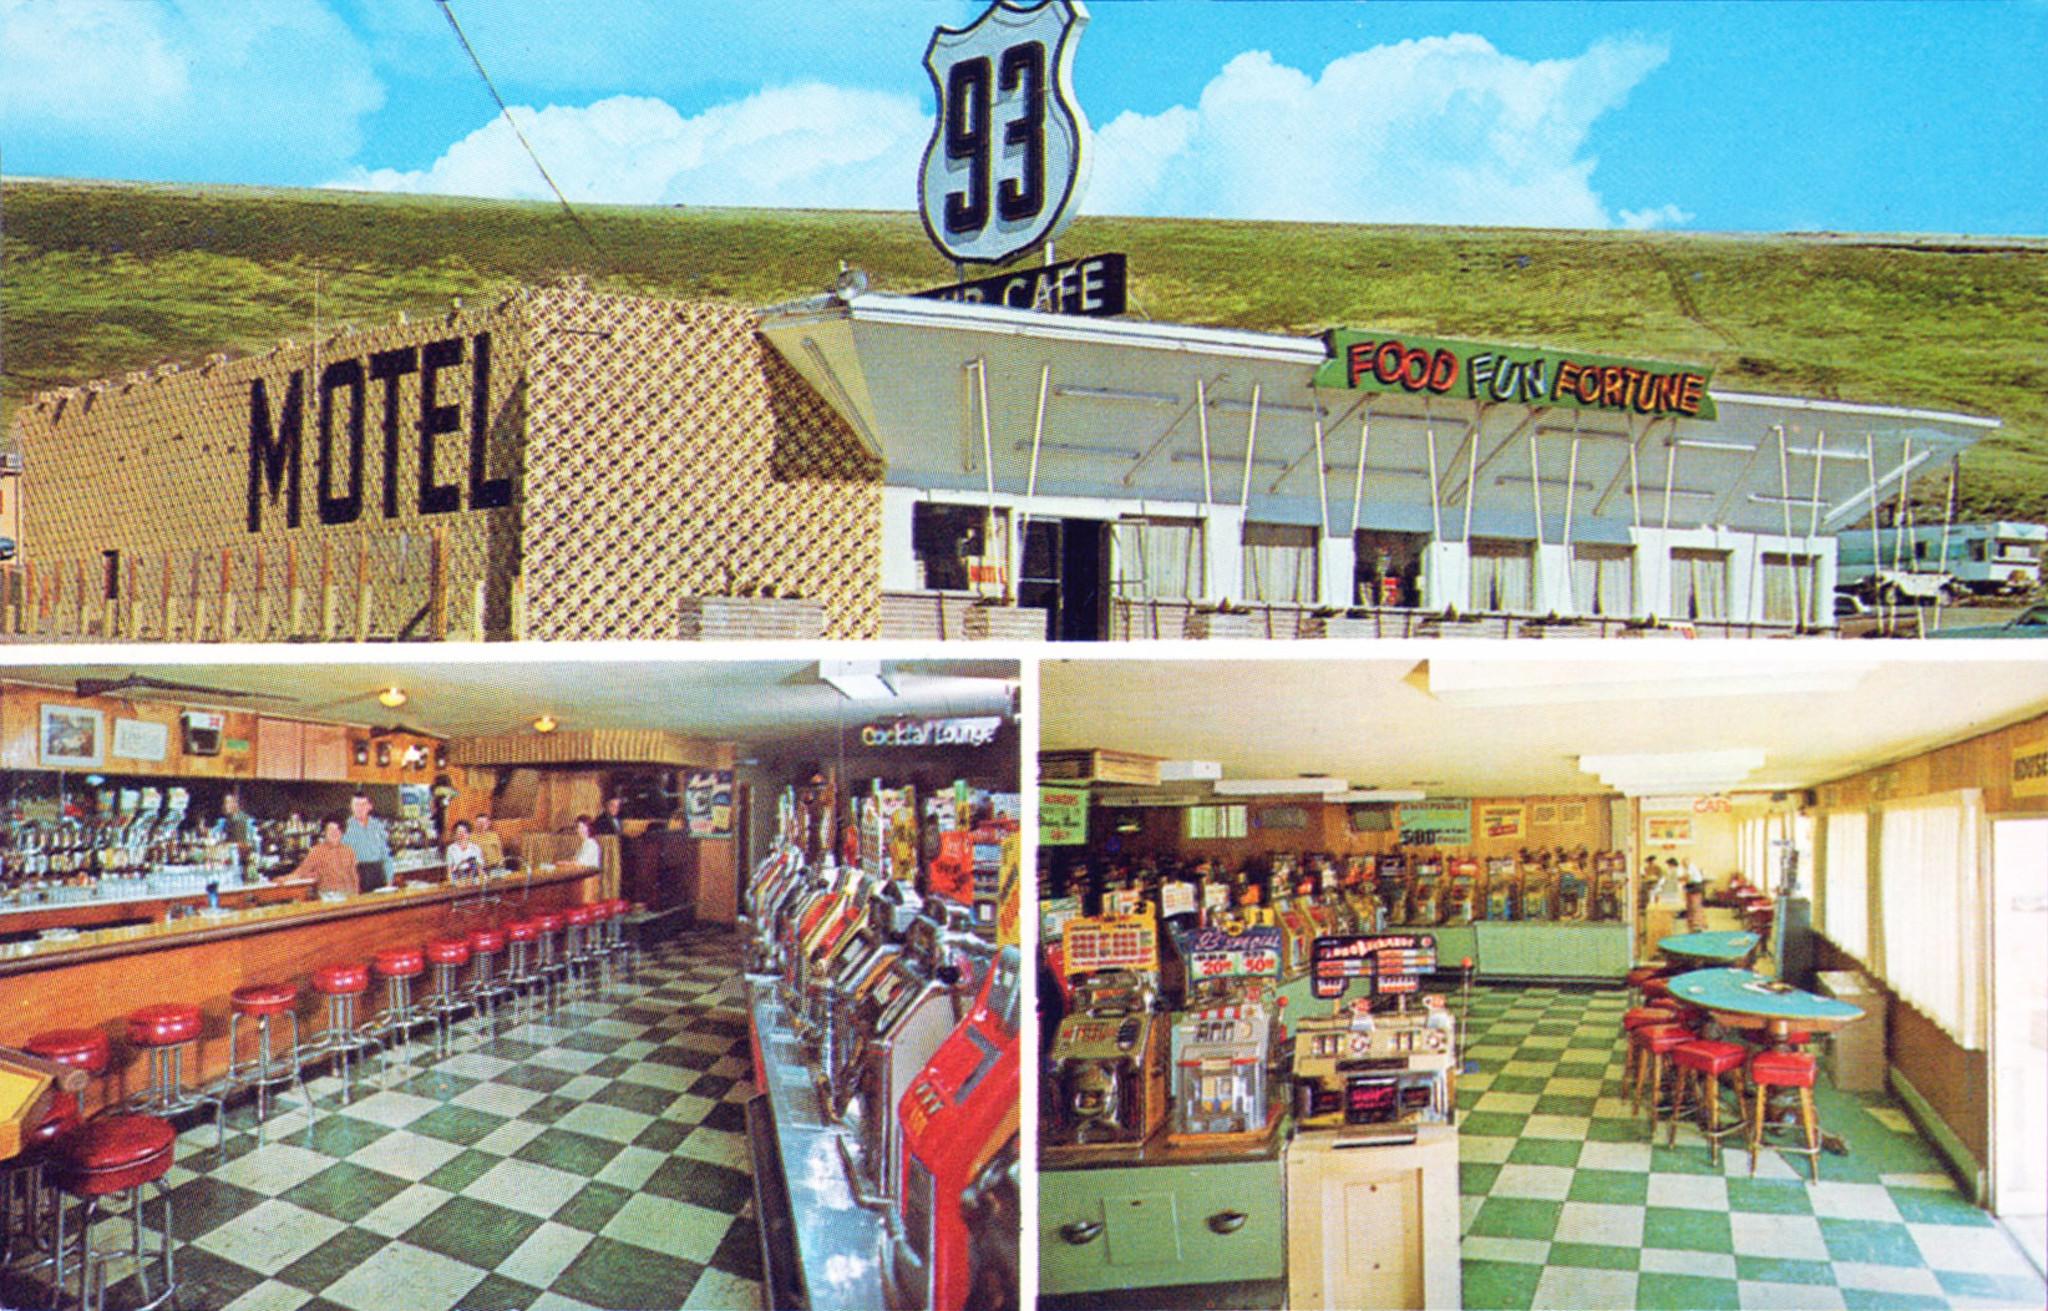 Club 93 - Jackpot, Nevada